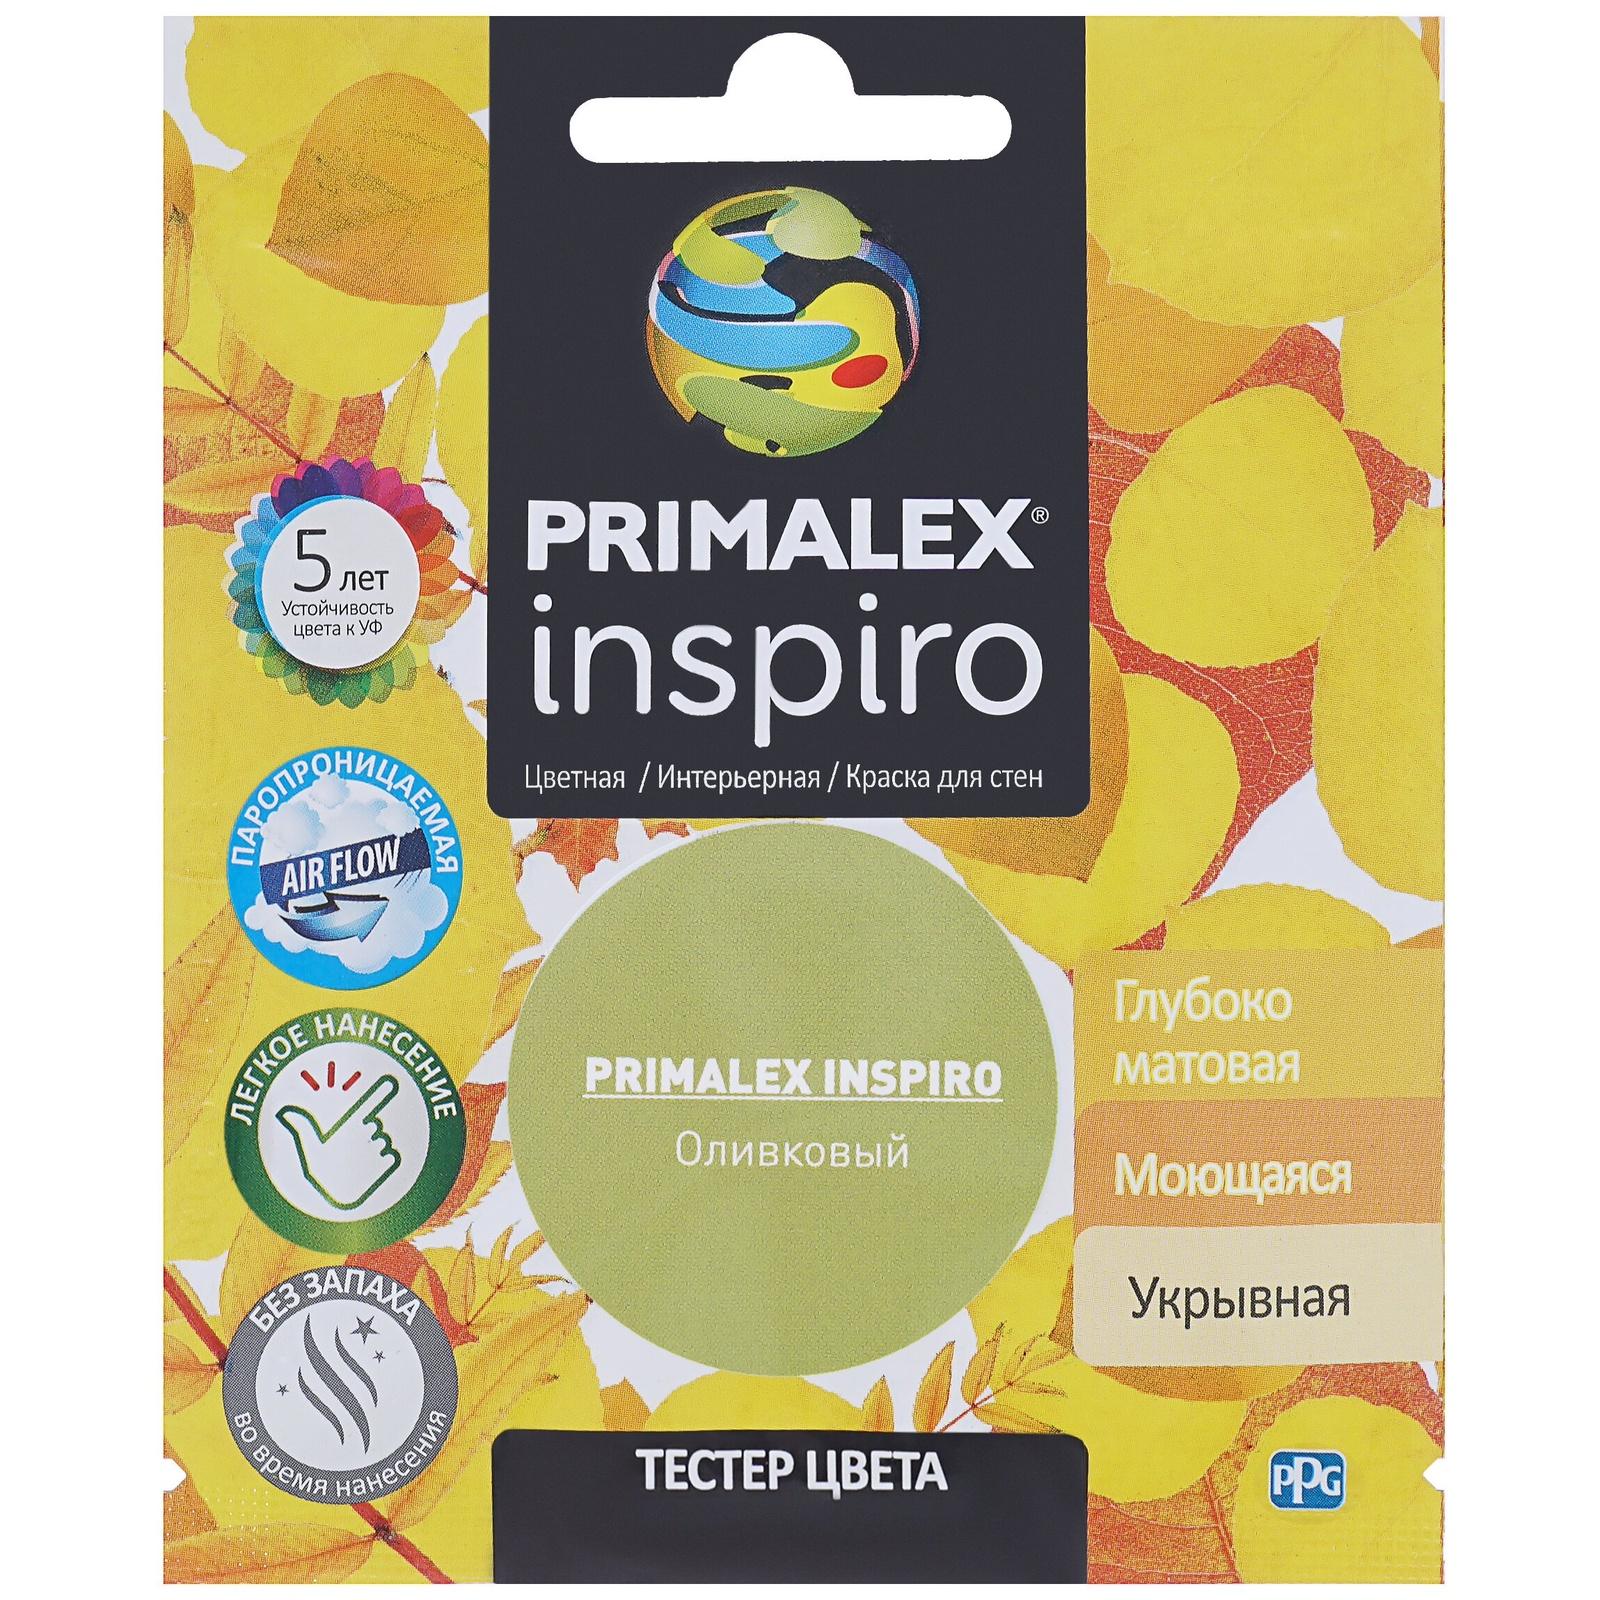 Краска PPG Primalex Inspiro Оливковый 40мл краска ppg primalex inspiro красный мак 40мл pmx i47